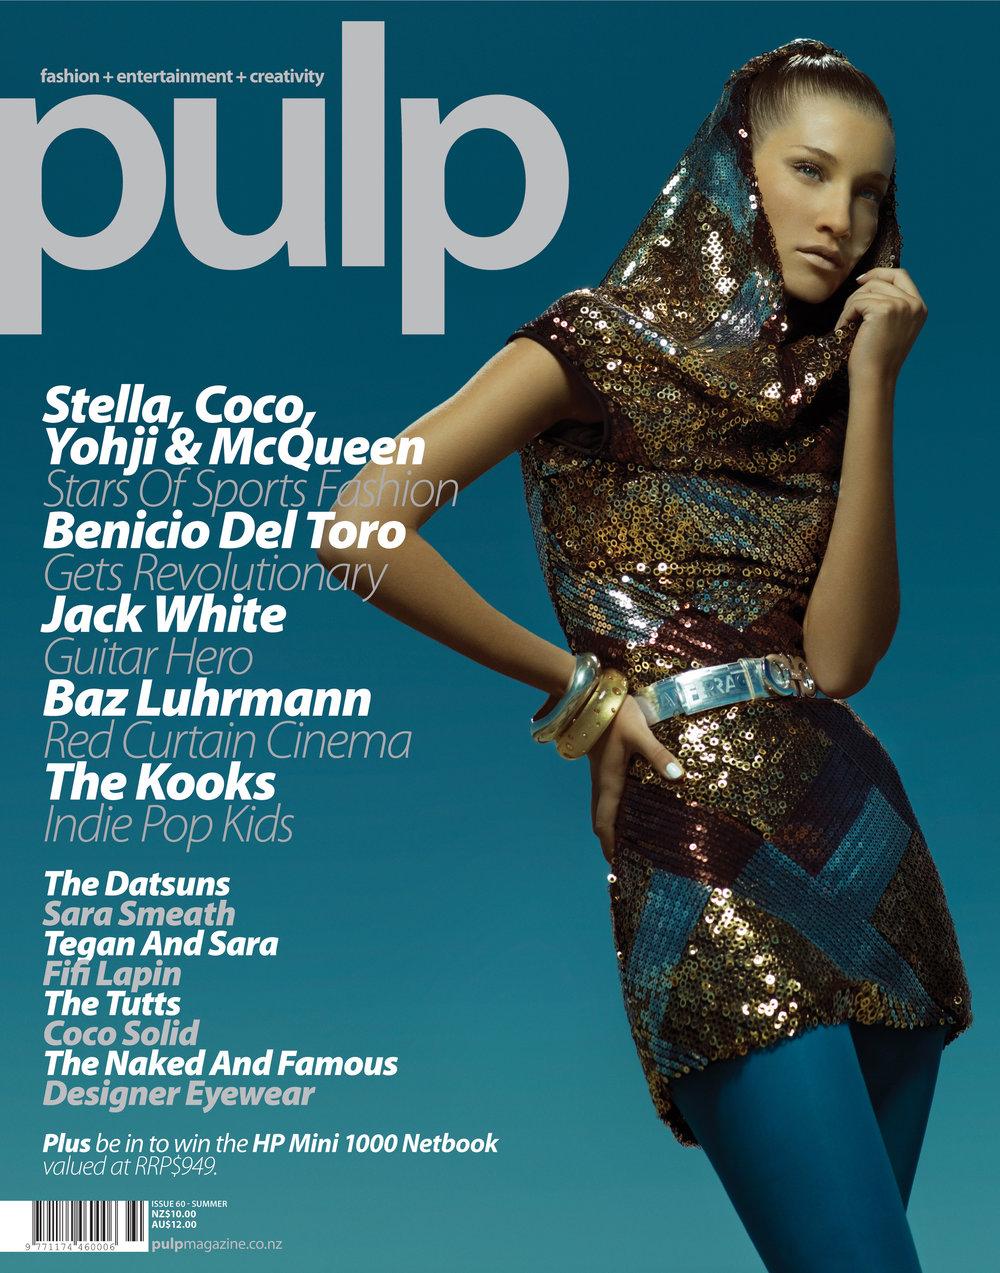 1 Pulp Cover.jpg